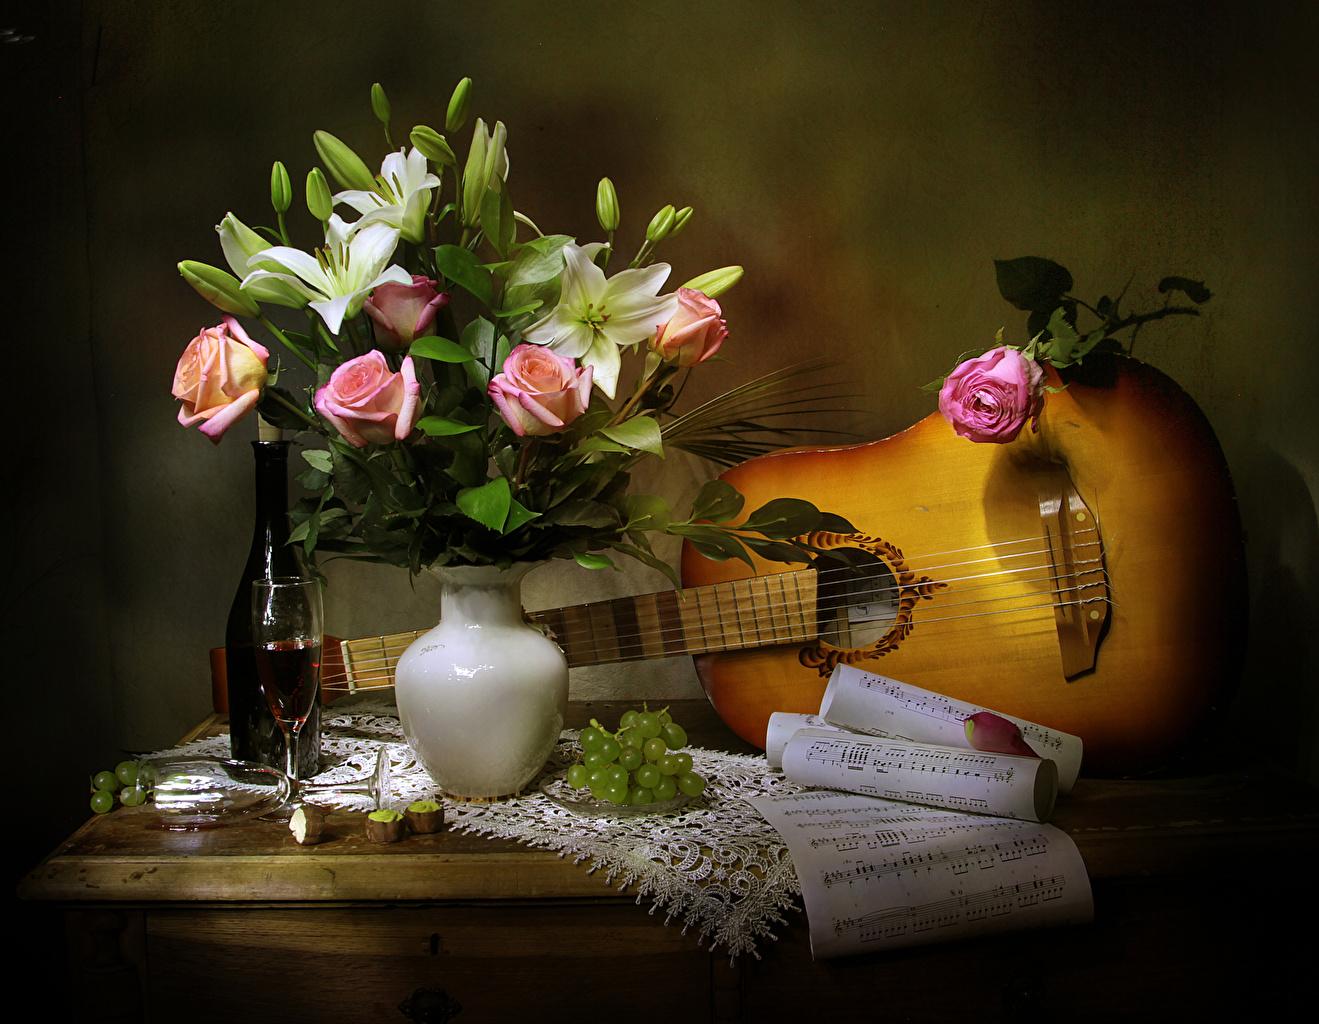 Фотография Ноты Гитара Розы Вино Тюльпаны Цветы Виноград Ваза Бокалы Бутылка Натюрморт